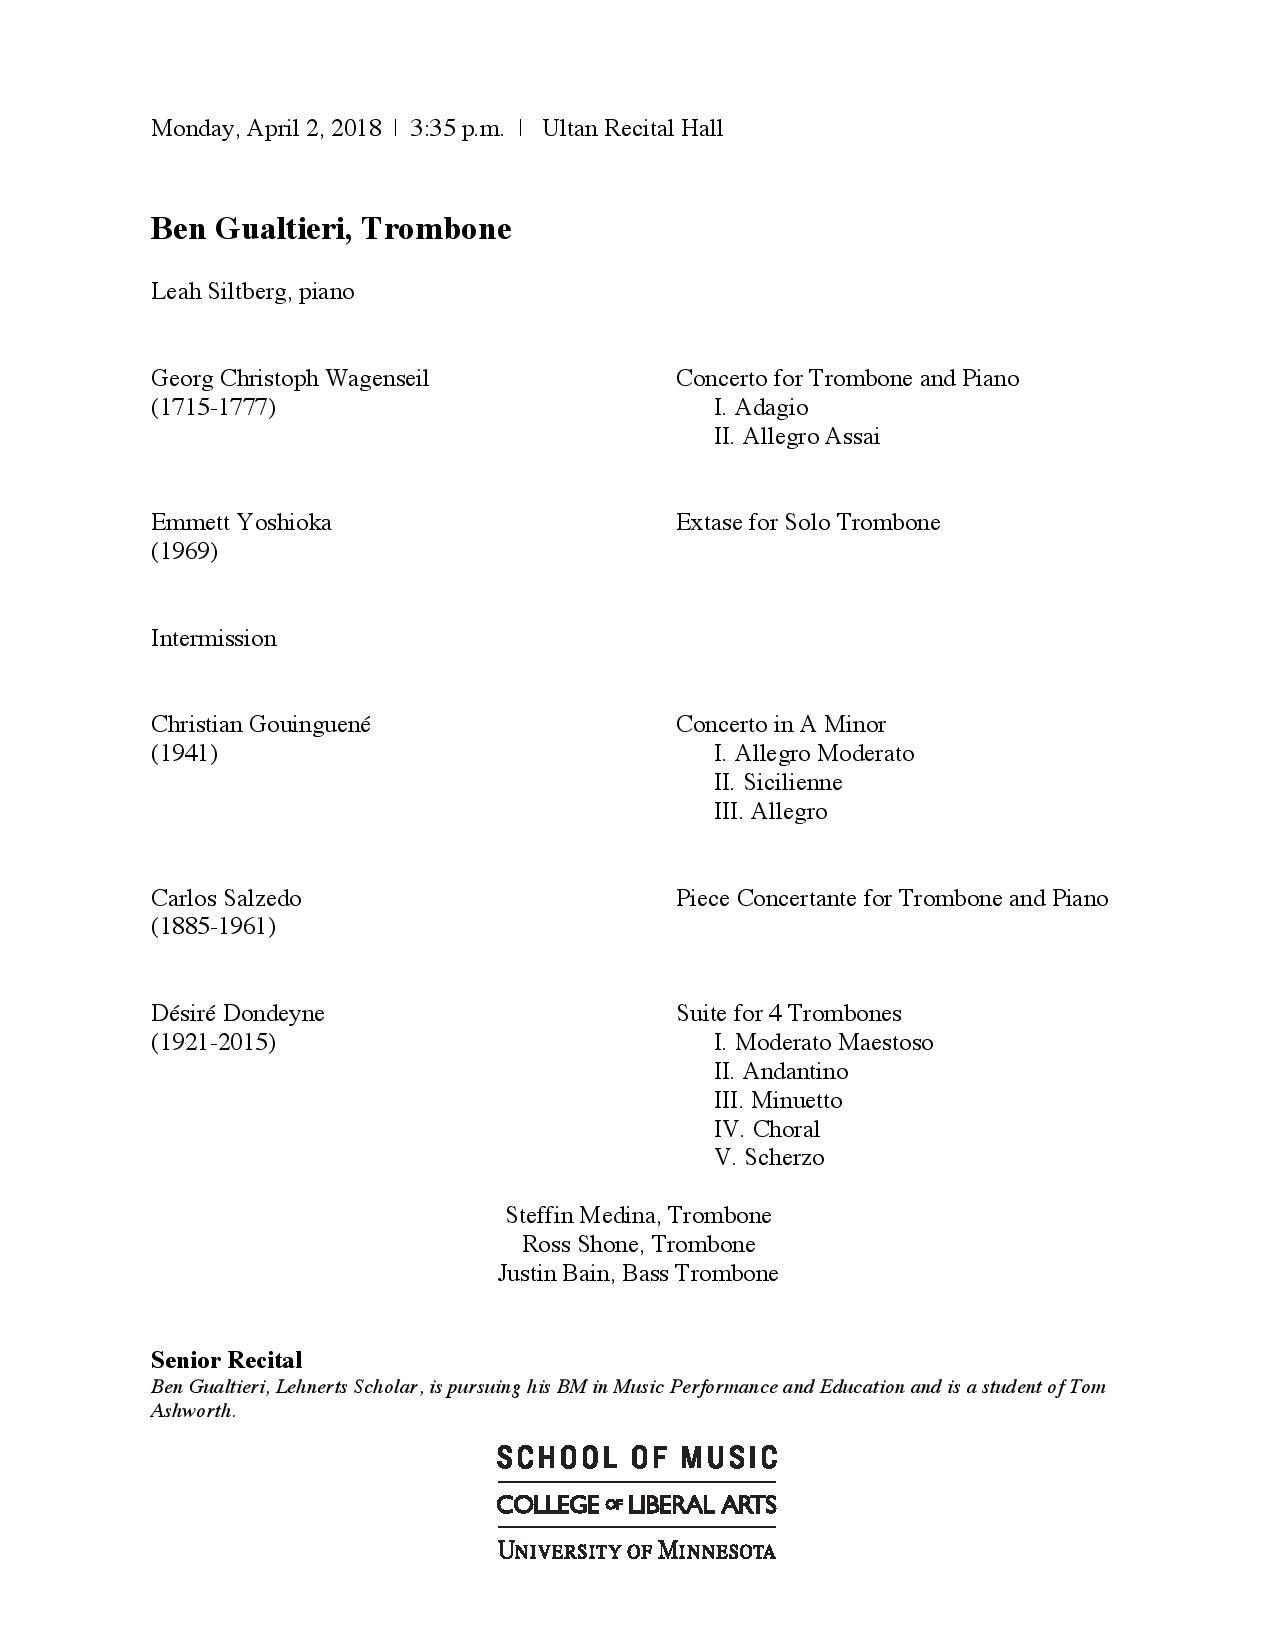 Umn Academic Calendar.U Of M Trombone Studio